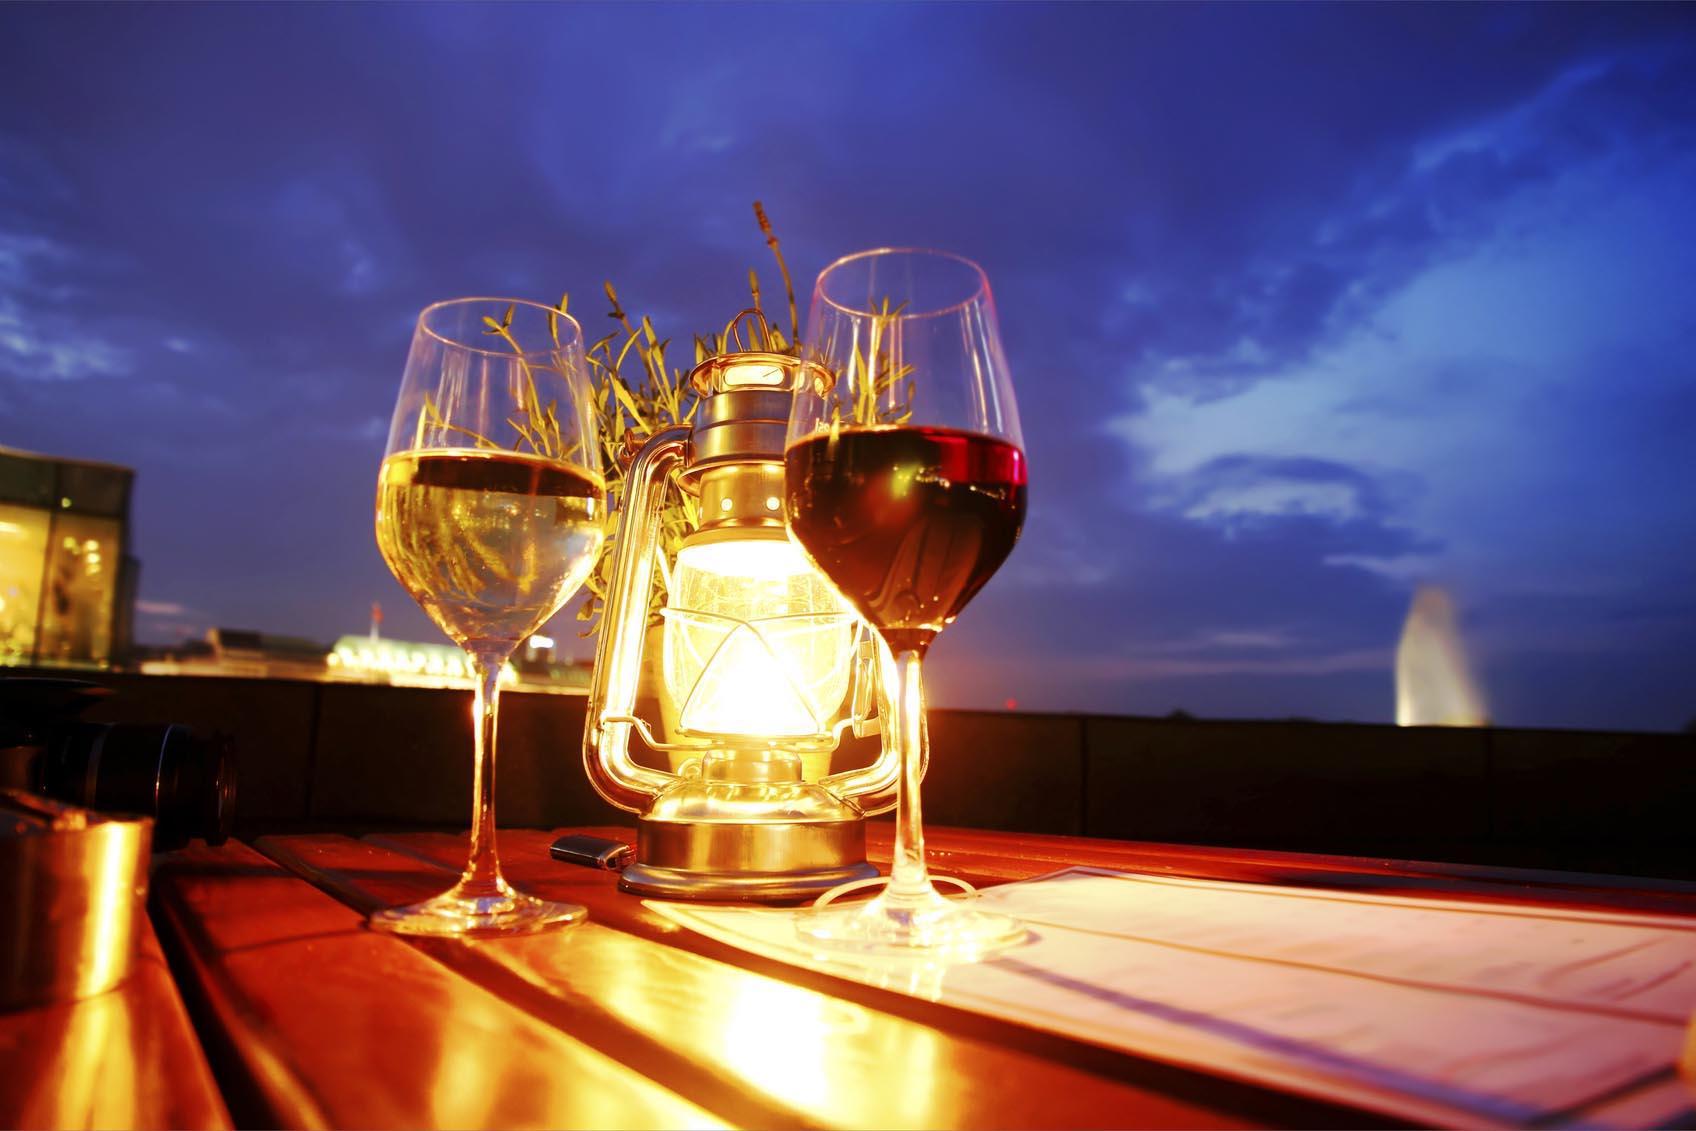 deux verres de vin Bordelais en terrasse